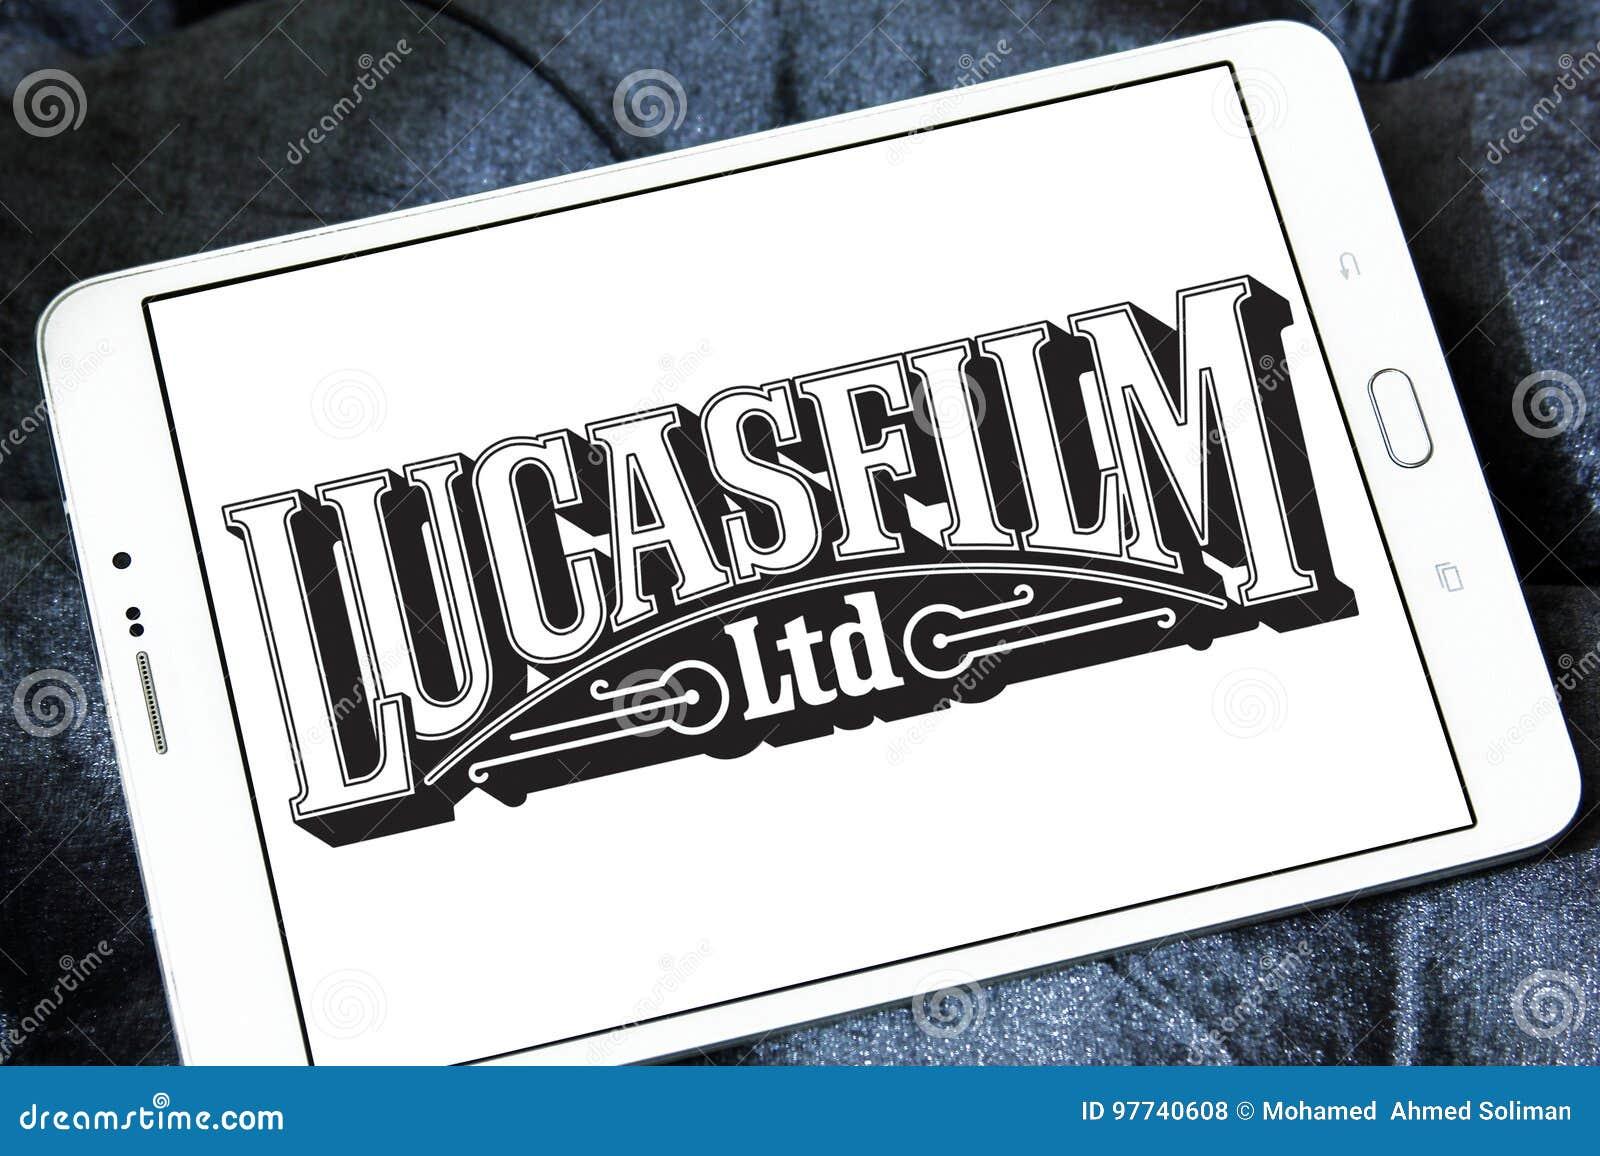 Lucasfilm logo editorial stock photo. Image of disneytoon ... Lucasfilm Logo Vector